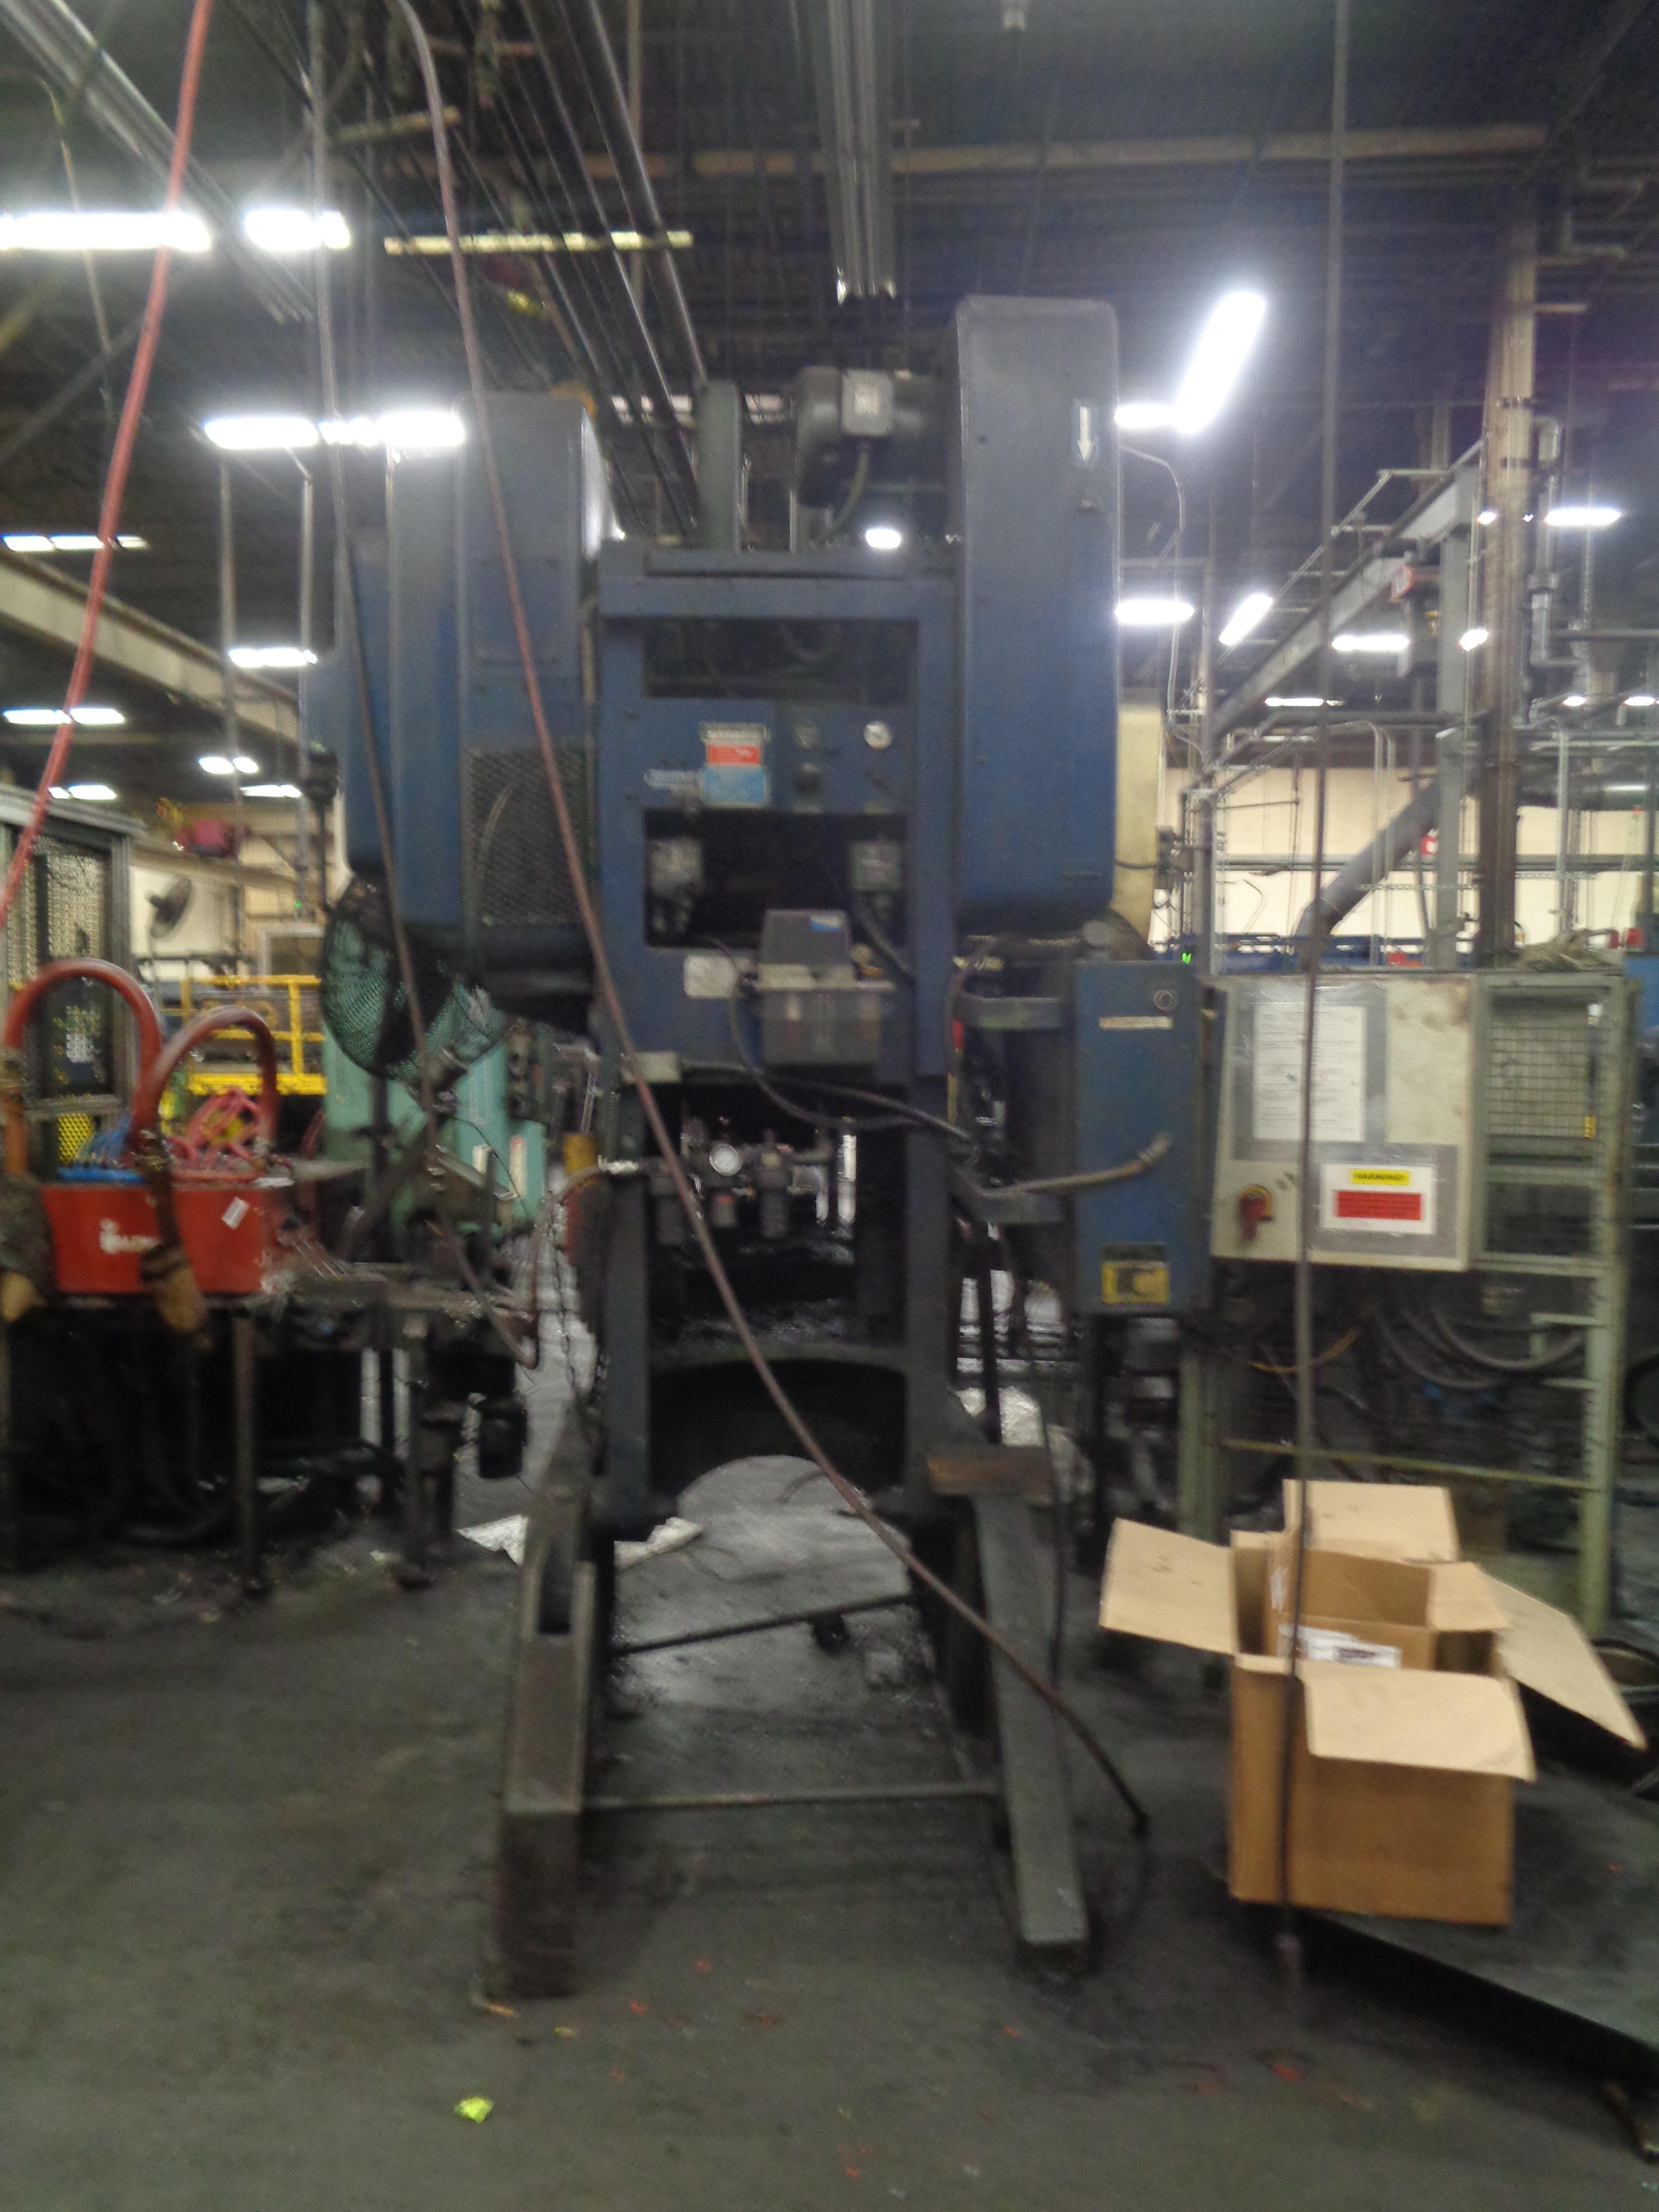 Bliss Press 60 Ton - Located in Swedsboro NJ - Image 2 of 4